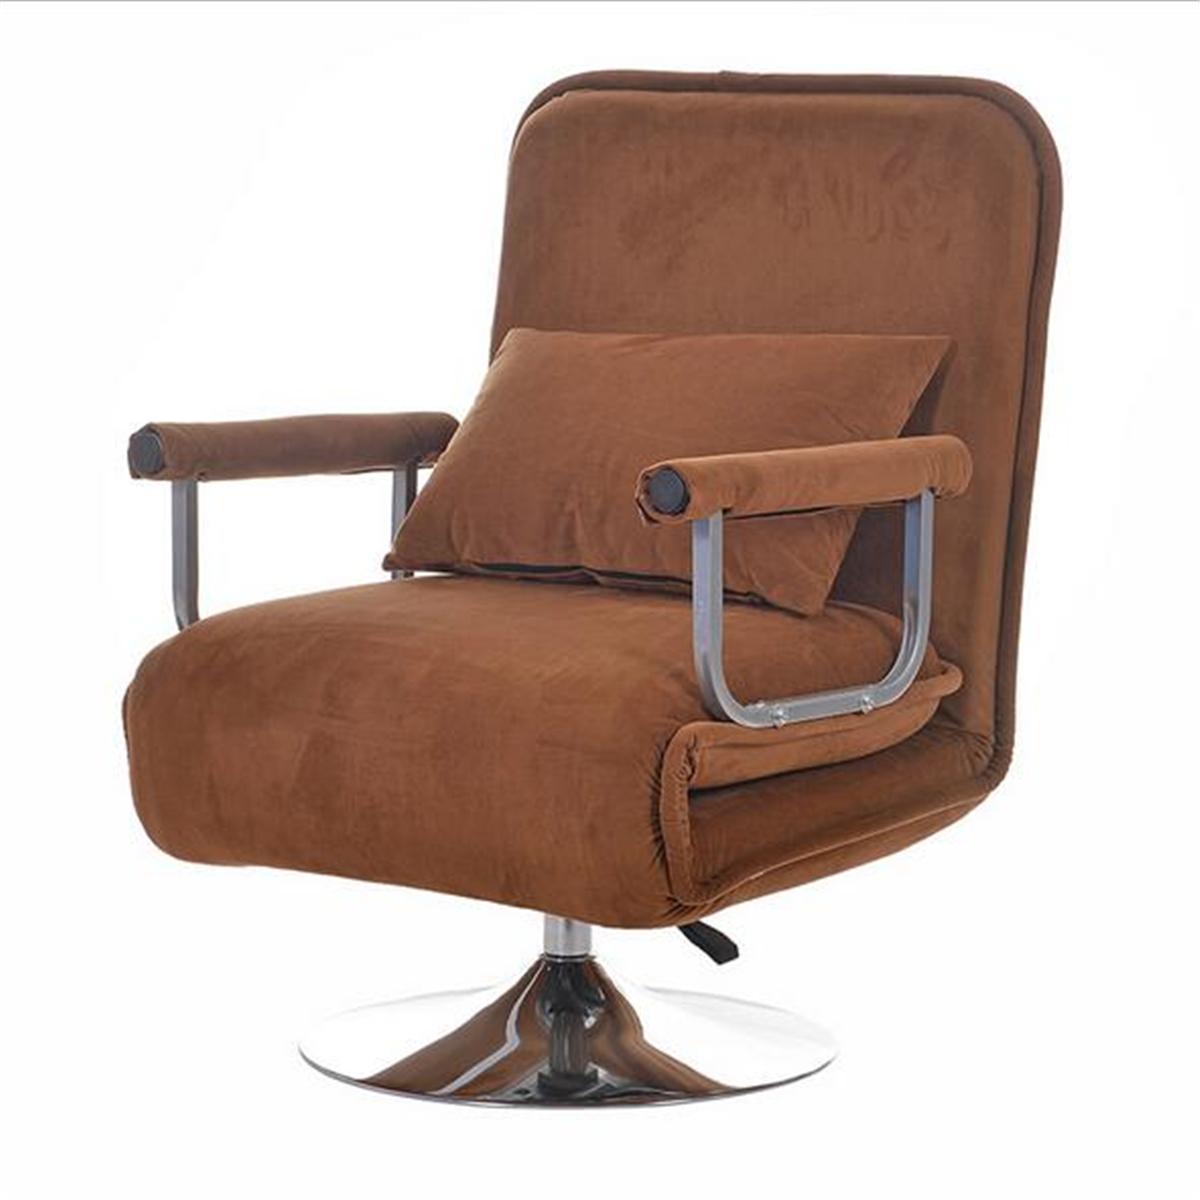 Convertible Rotation Sofa Bed Folding Arm Chair Sleeper ...